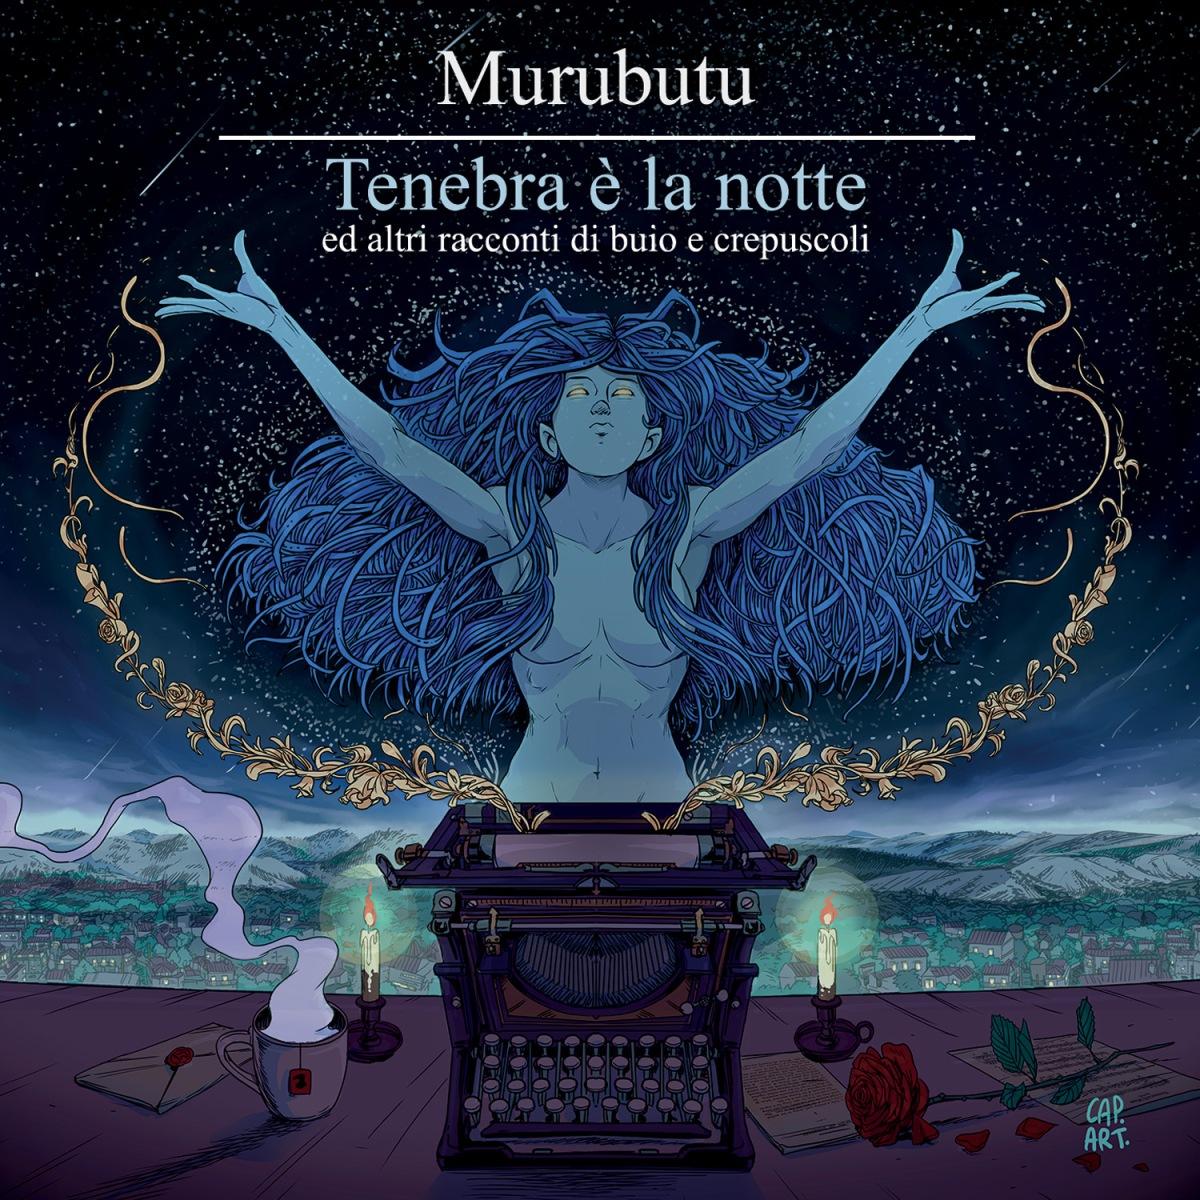 Murubutu – Tenebra è la notte ed altri racconti di bui e crepuscoli (Mandibola Records, 2019)